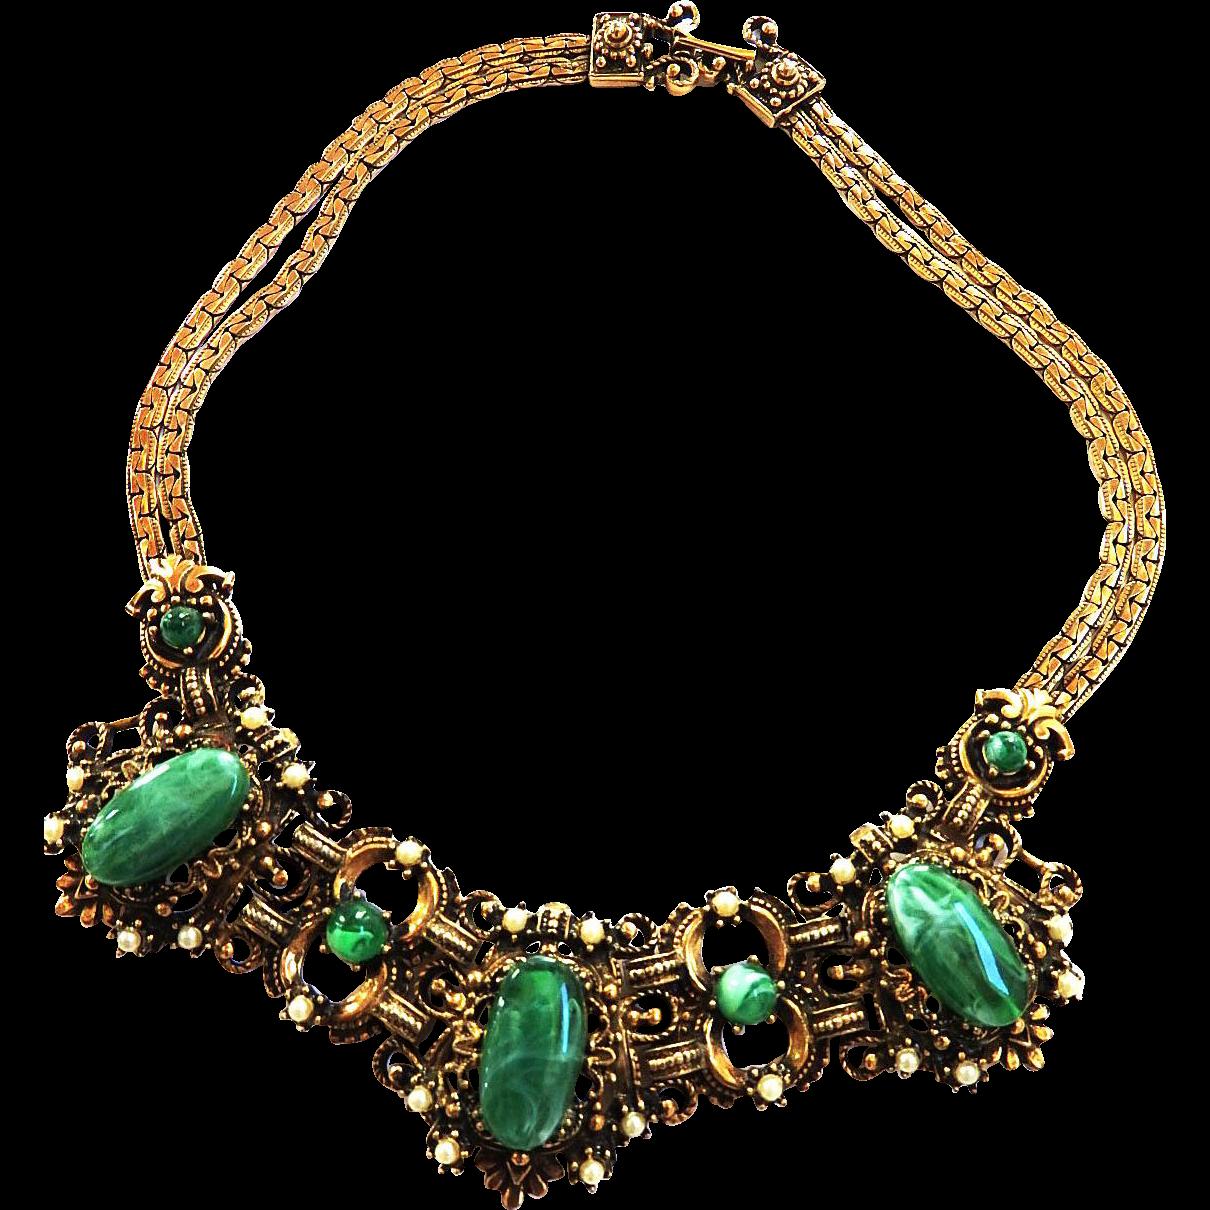 Big Emerald Green Cabochon and Faux Pearl Vintage Necklace Bib/Collar Rhinestone